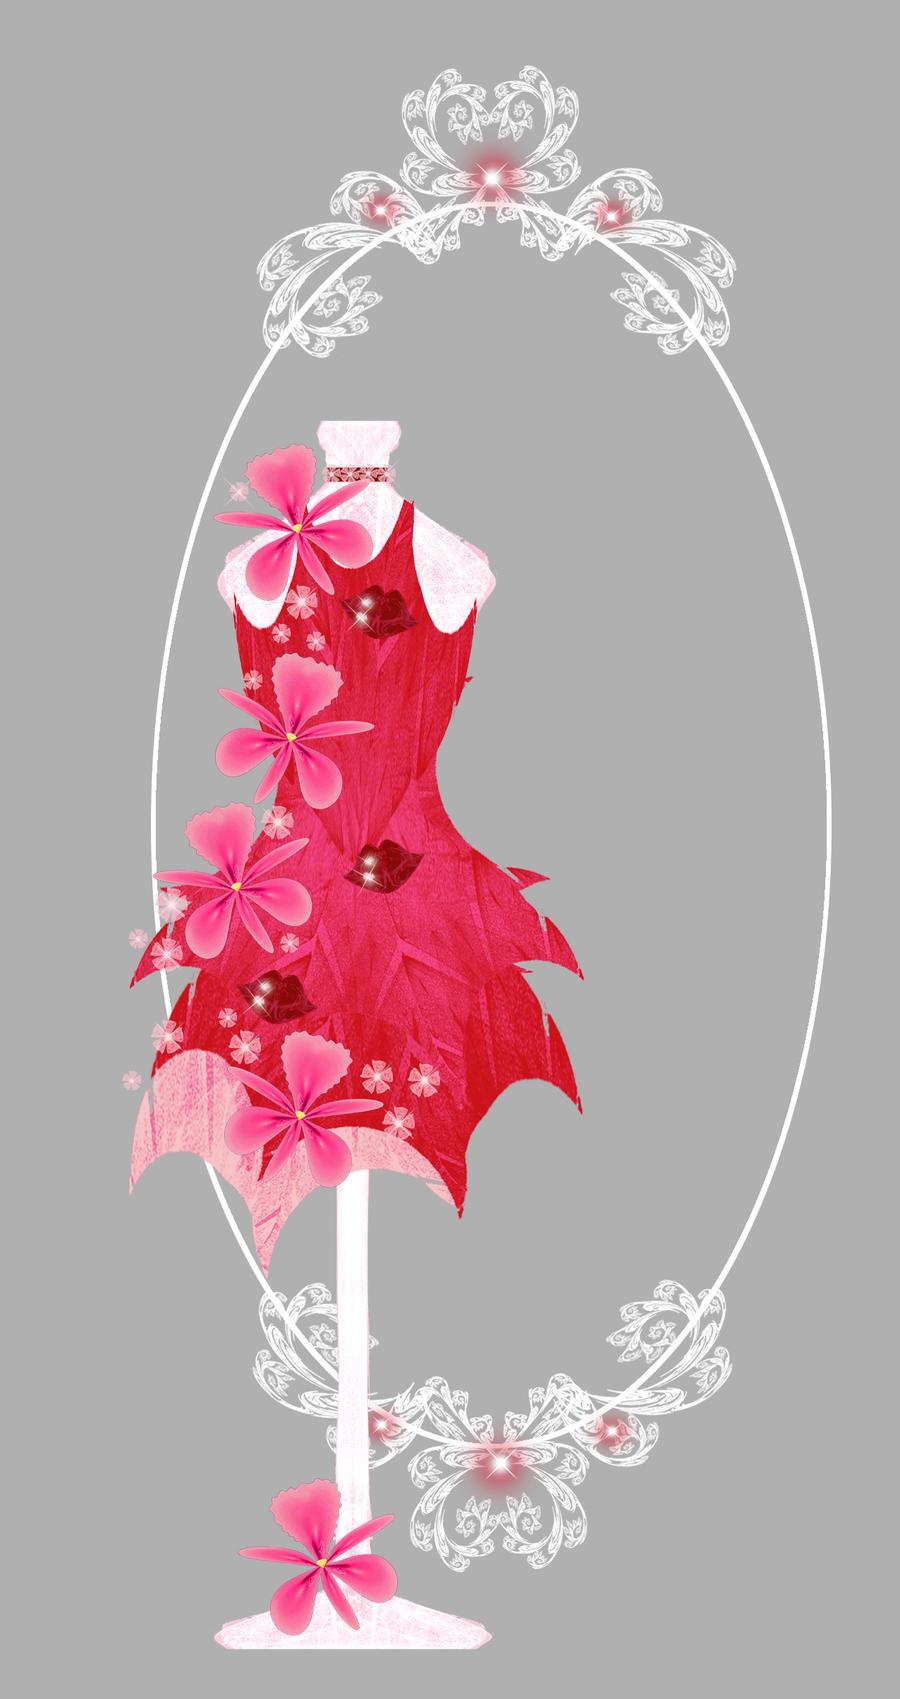 Seven Sins Dresses - Lust by rockgem